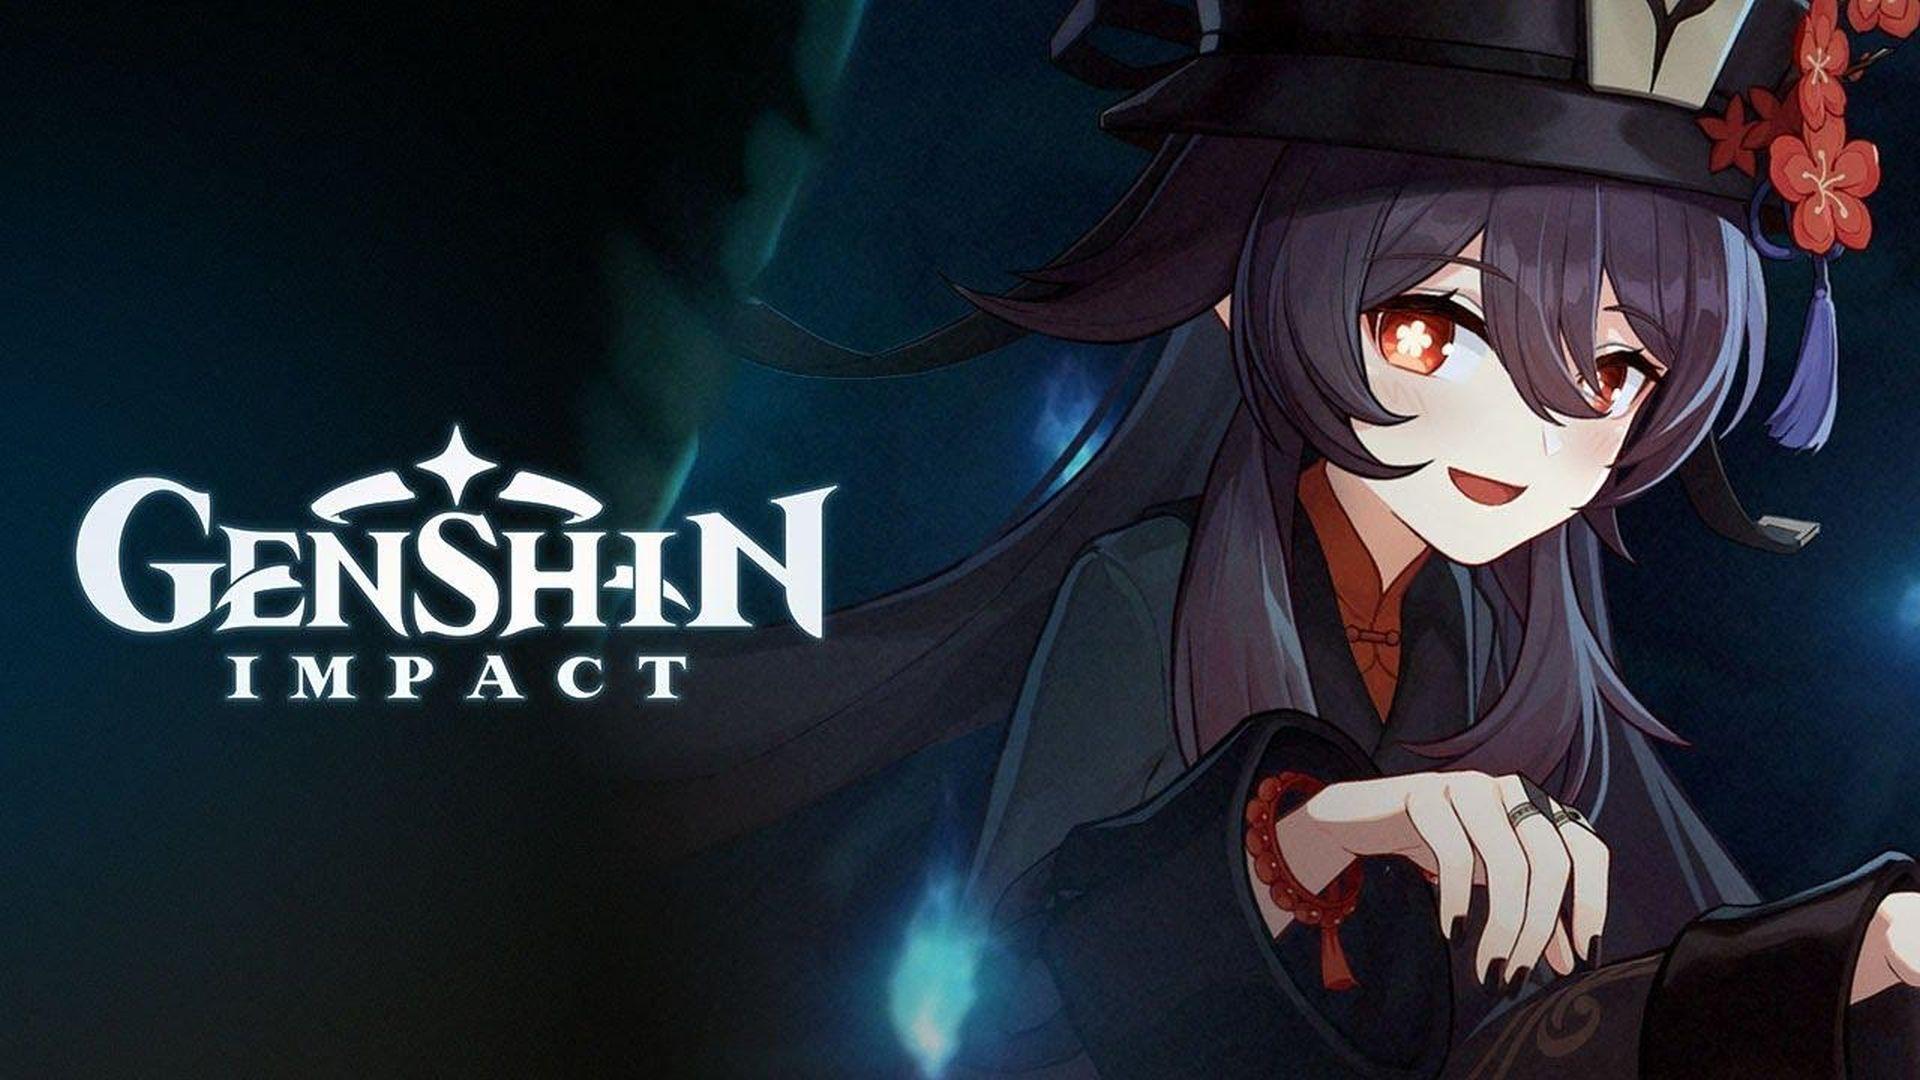 Genshin Impact - Hu Tao